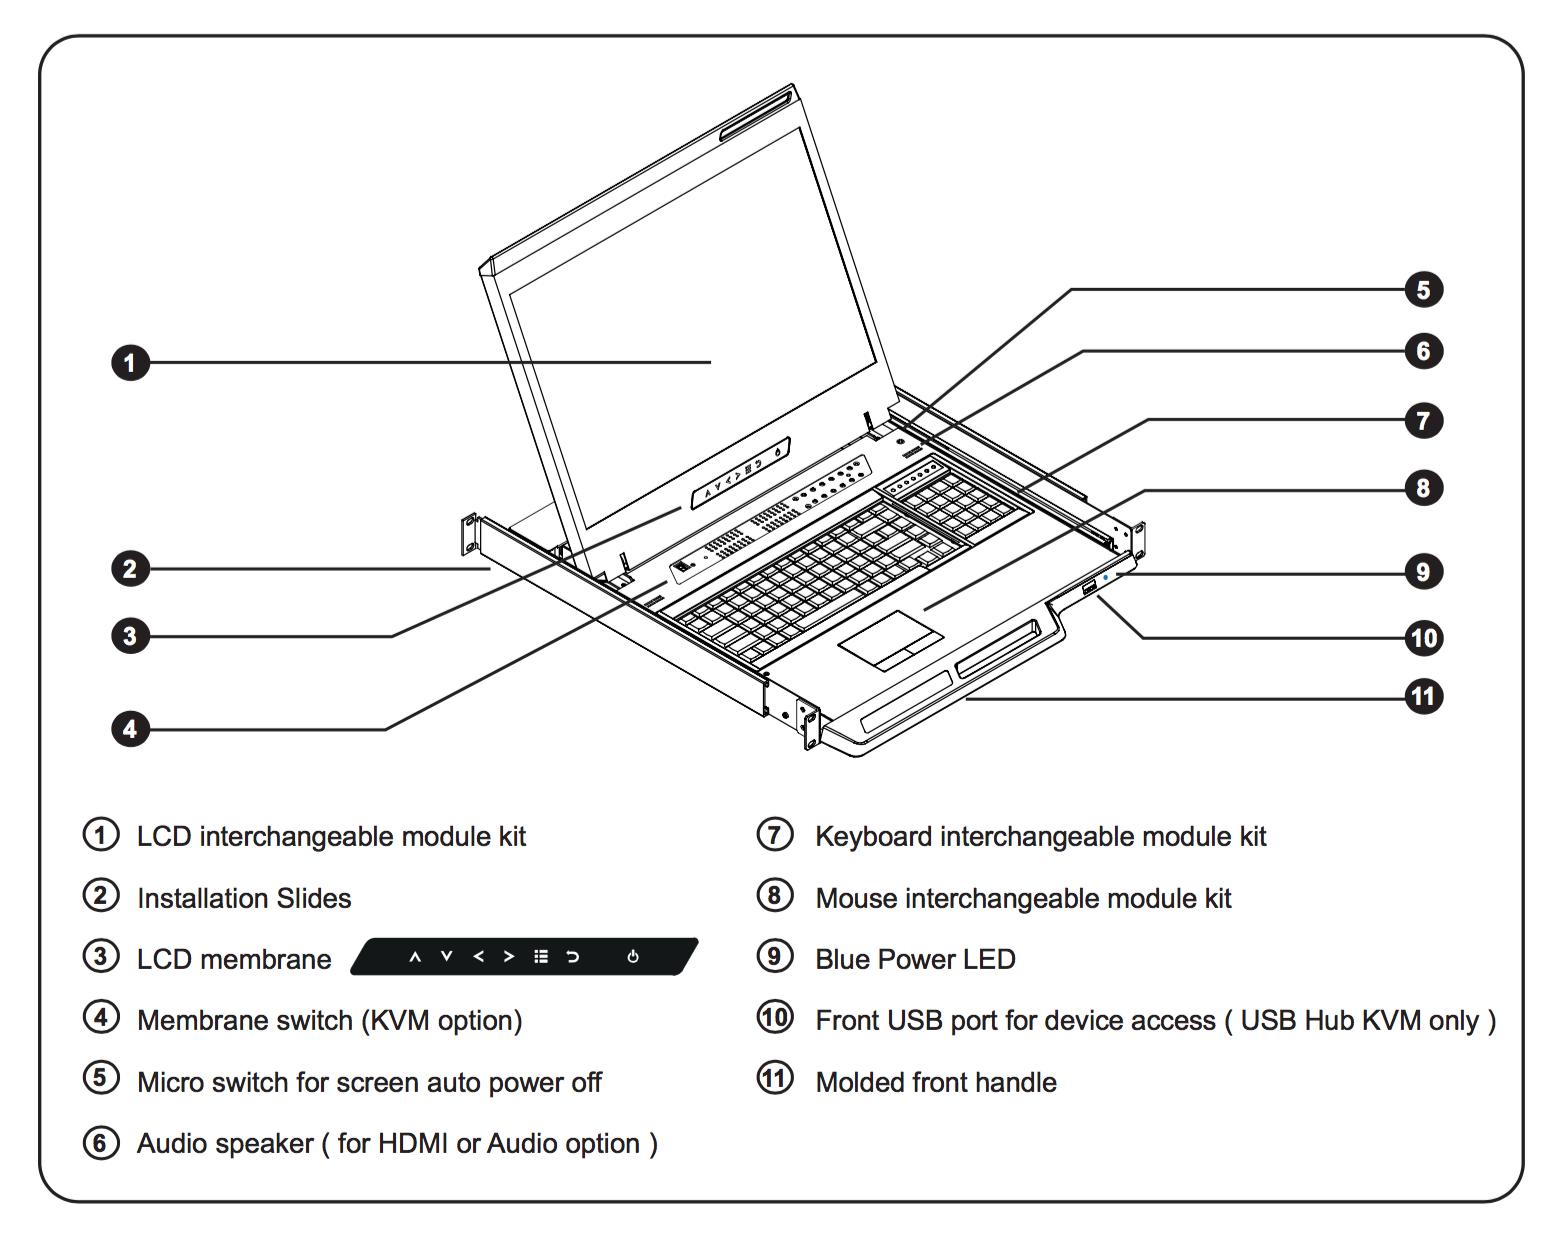 RWX119 Diagram